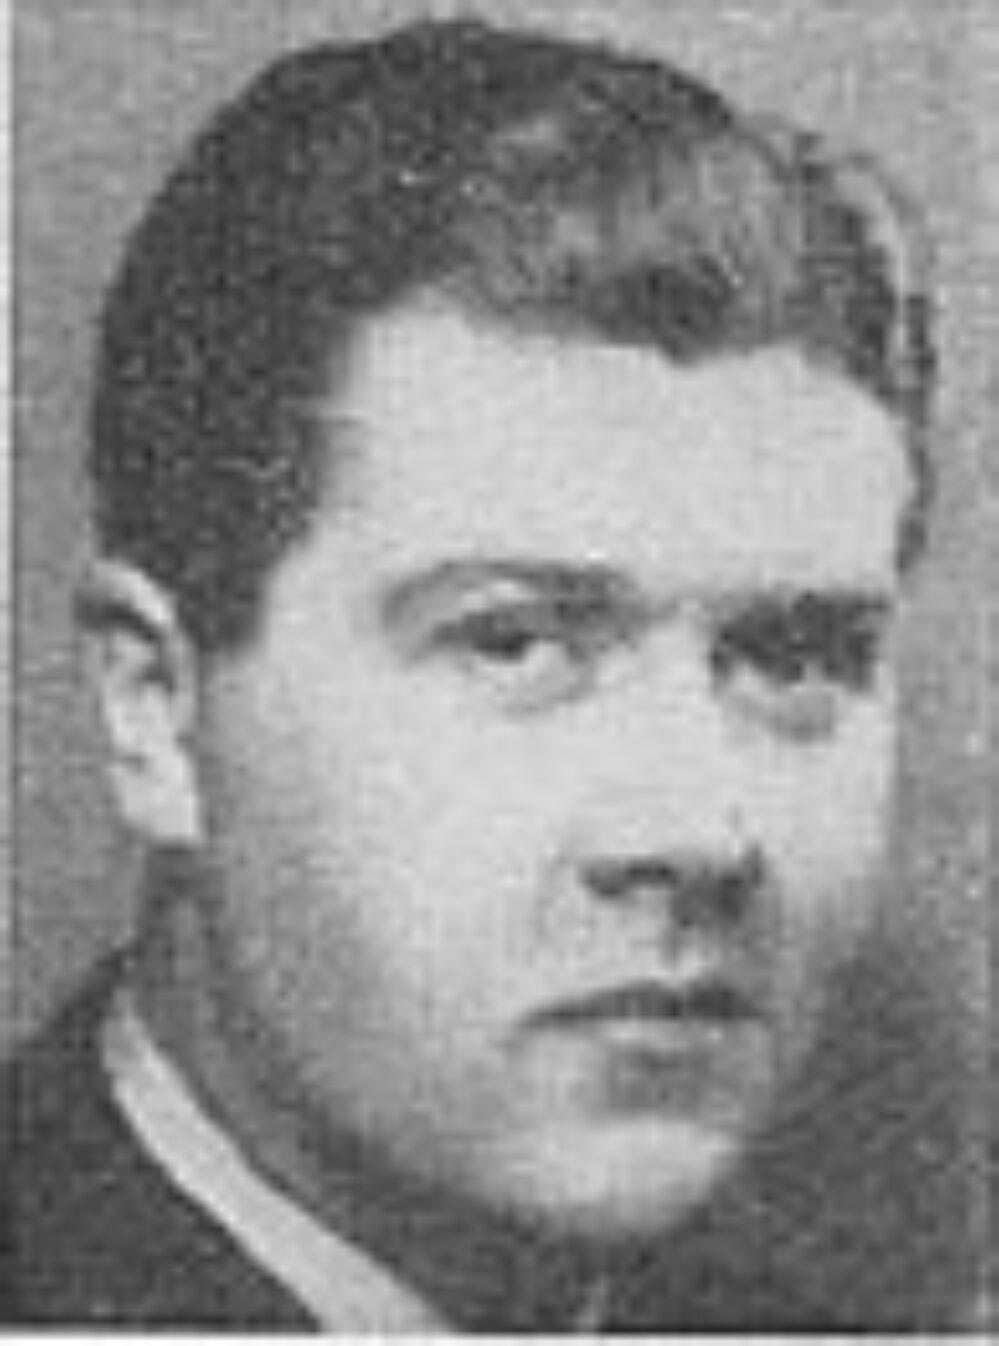 Jan Jørgen Haarstad